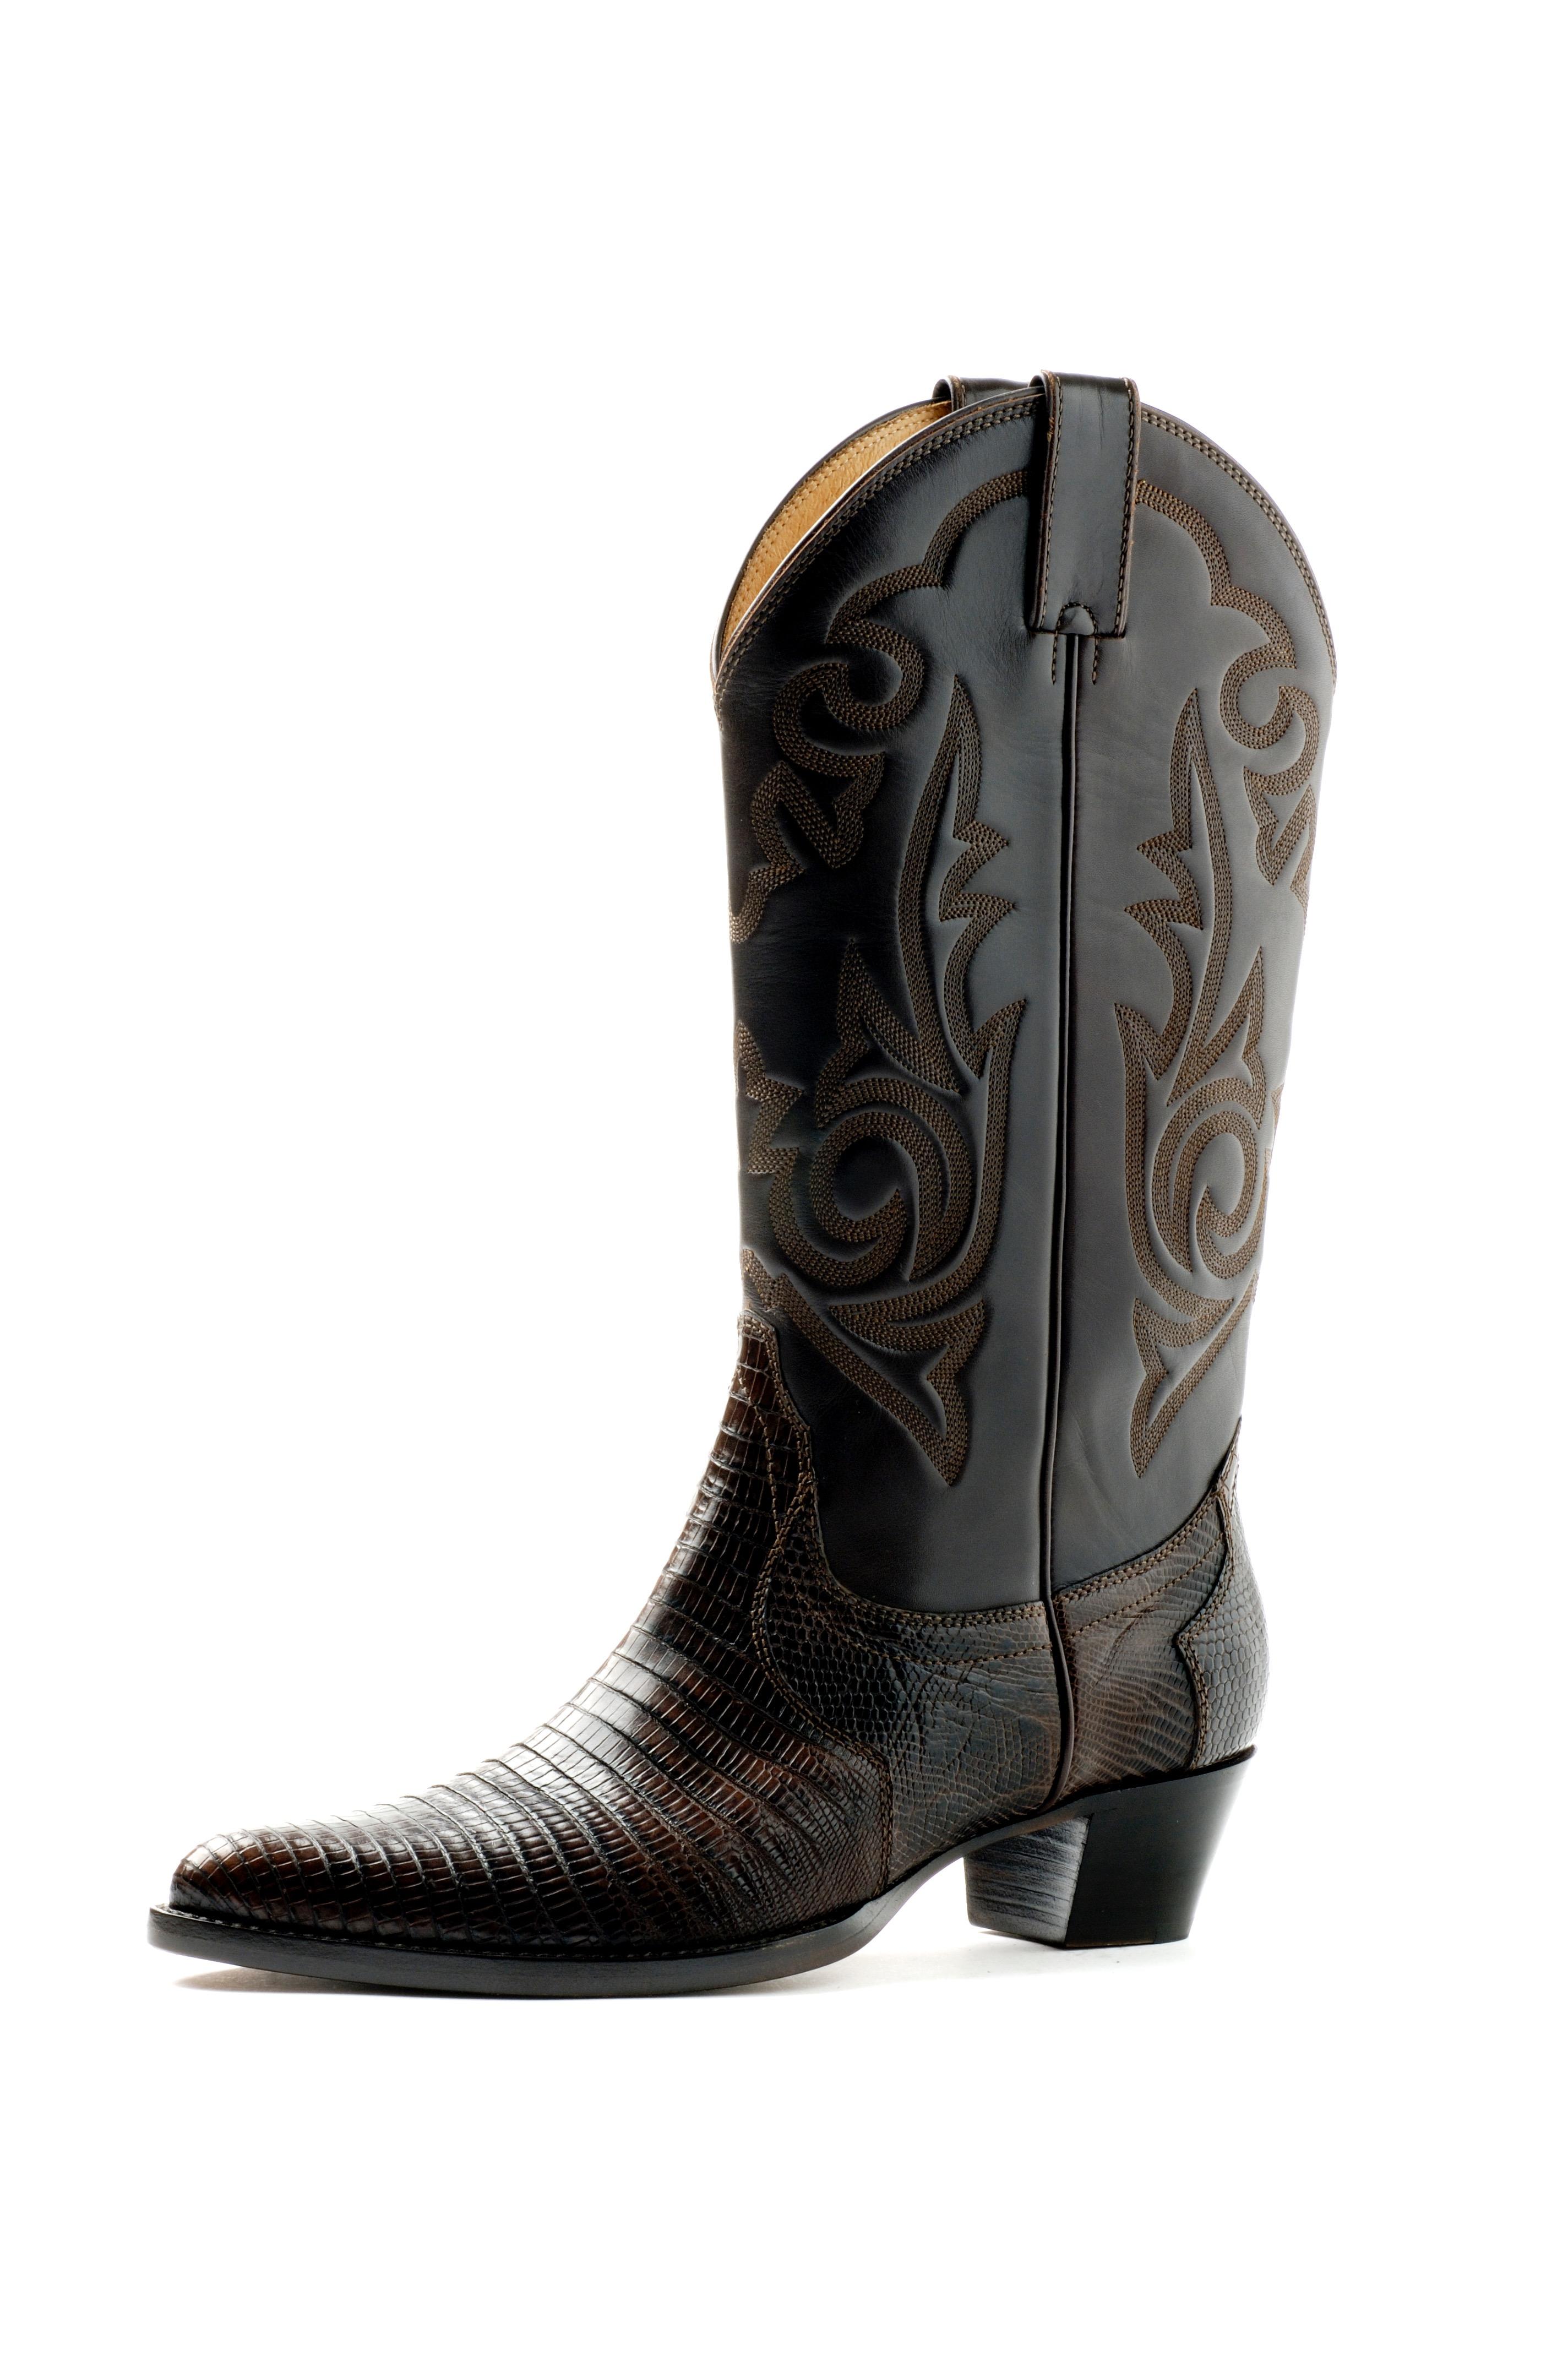 5ba74b235c741a Unützer - TEJUS Cowboy-Leder-Stiefel - Schaftweite  ca. 16 cmGolf ...